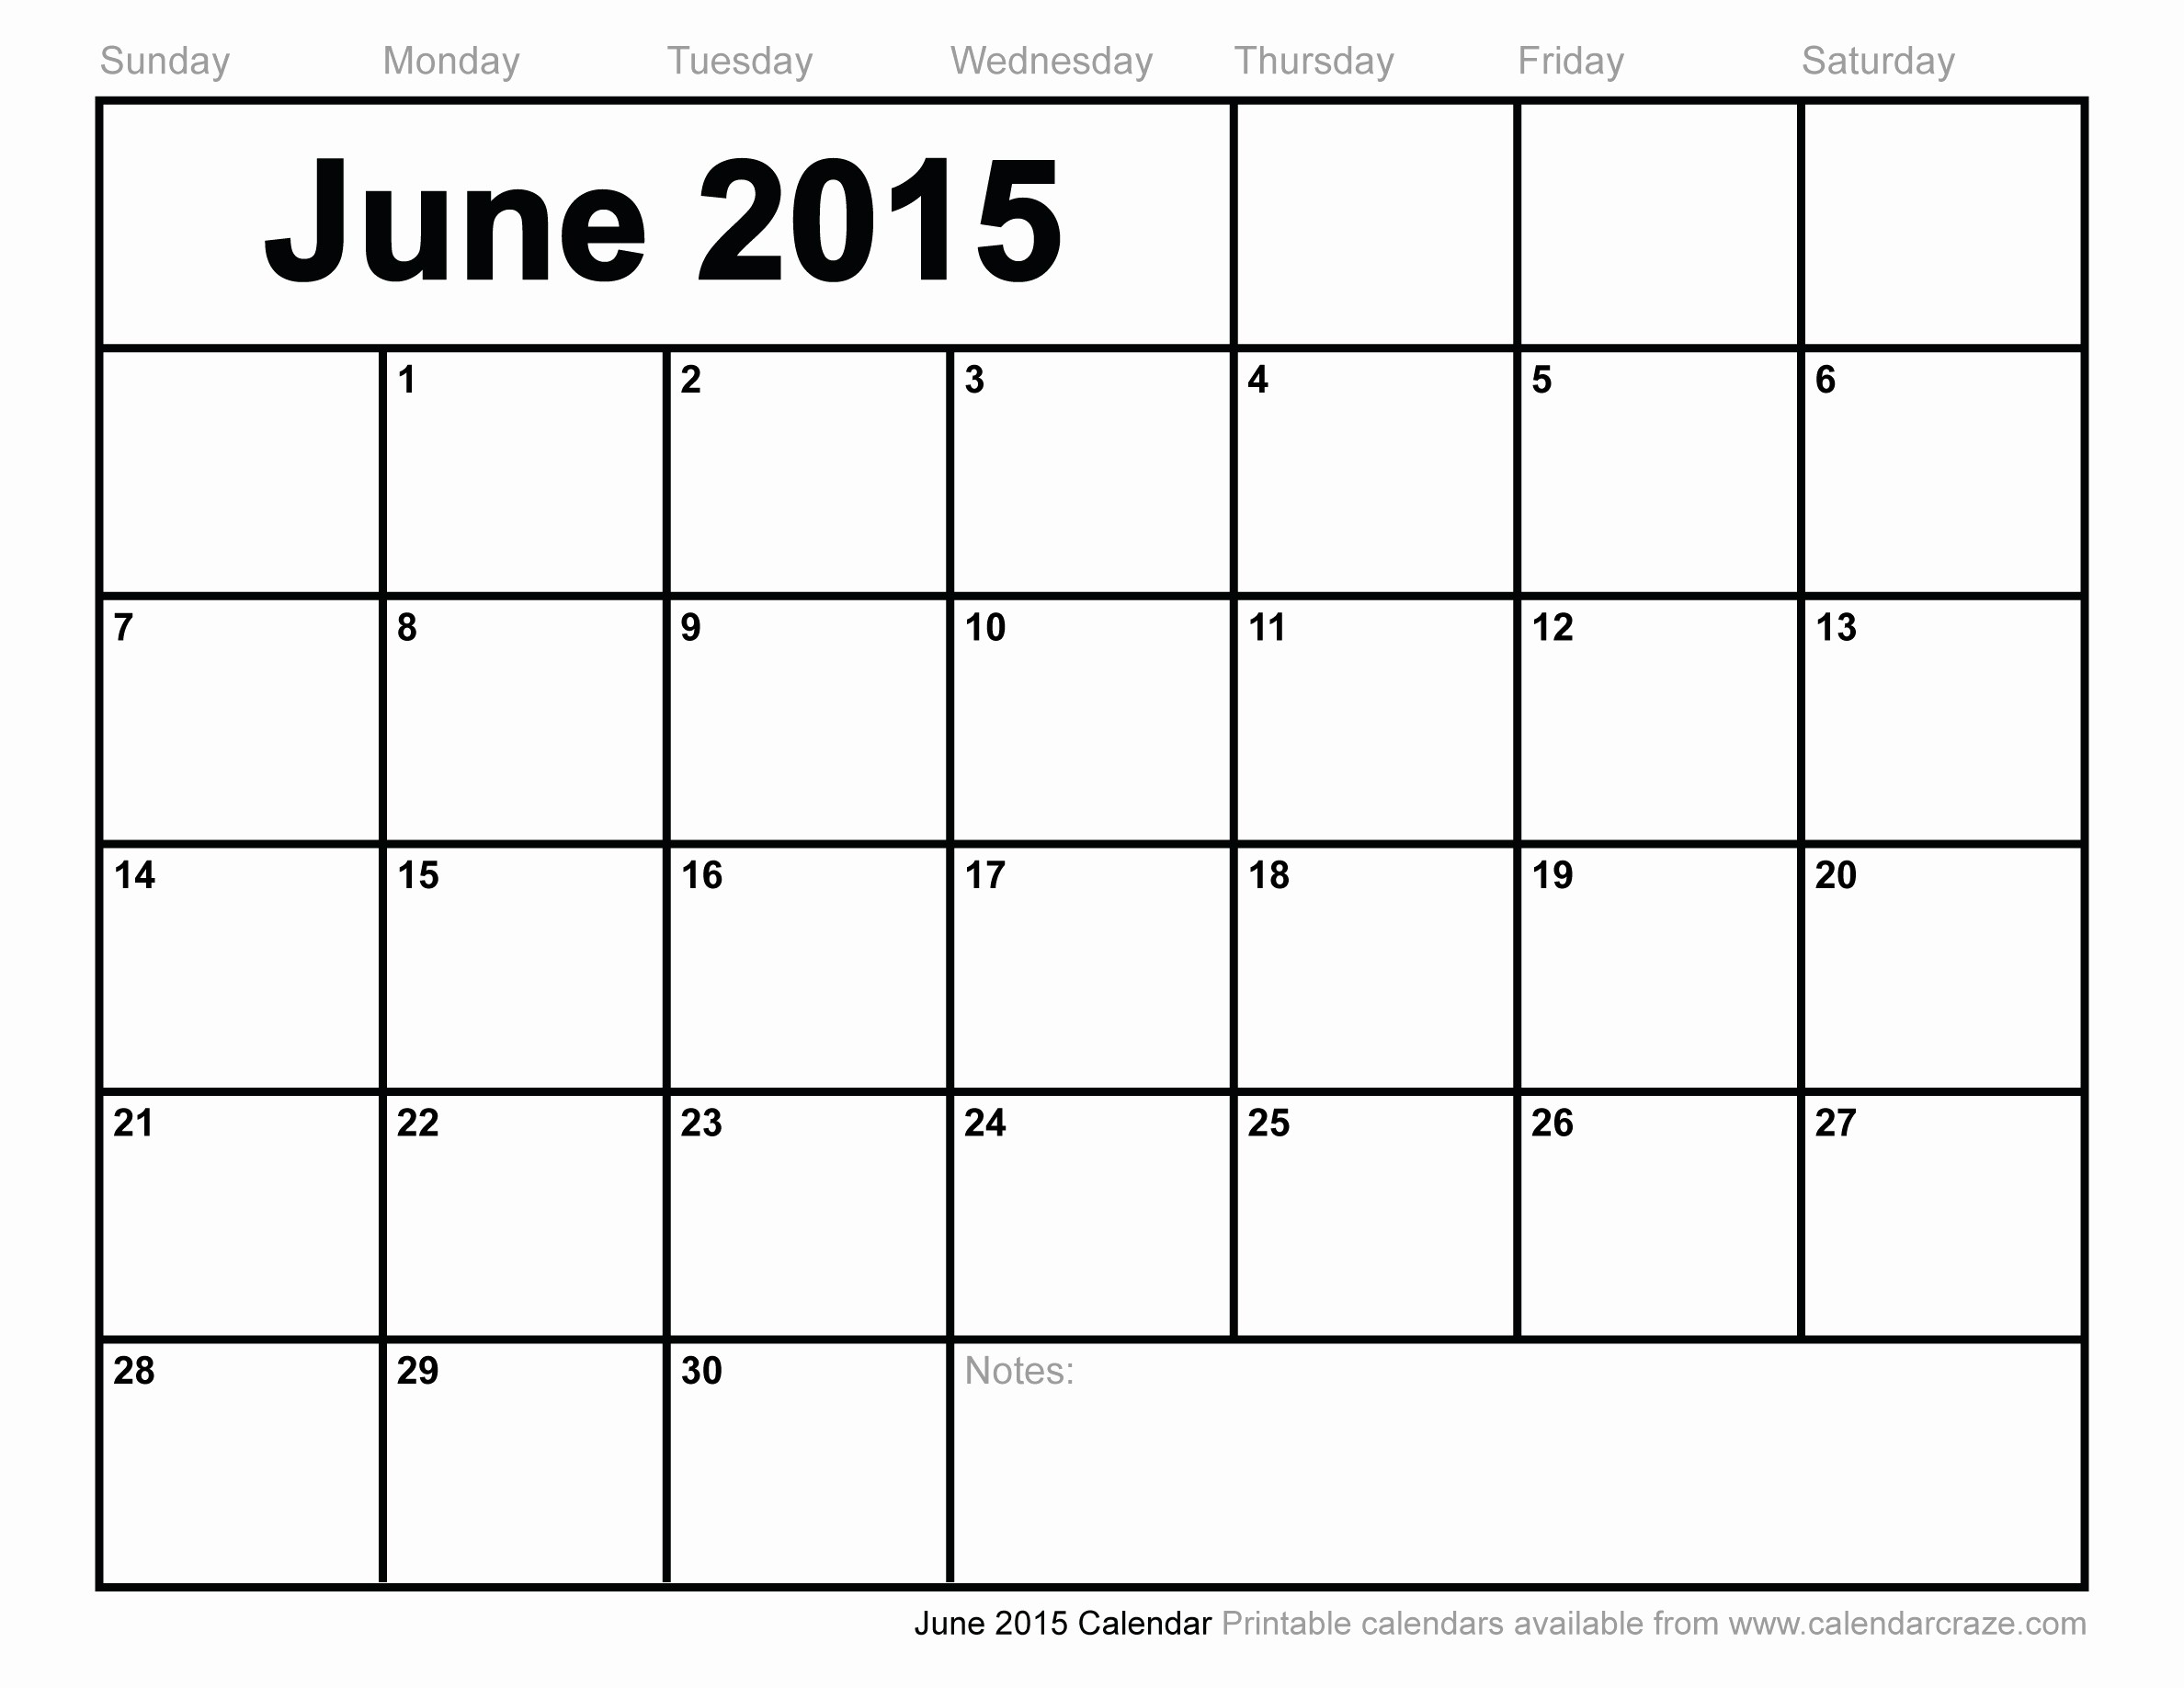 Calendar Template for June 2015 Unique 8 Best Of Printable June 2015 Calendar March 2015